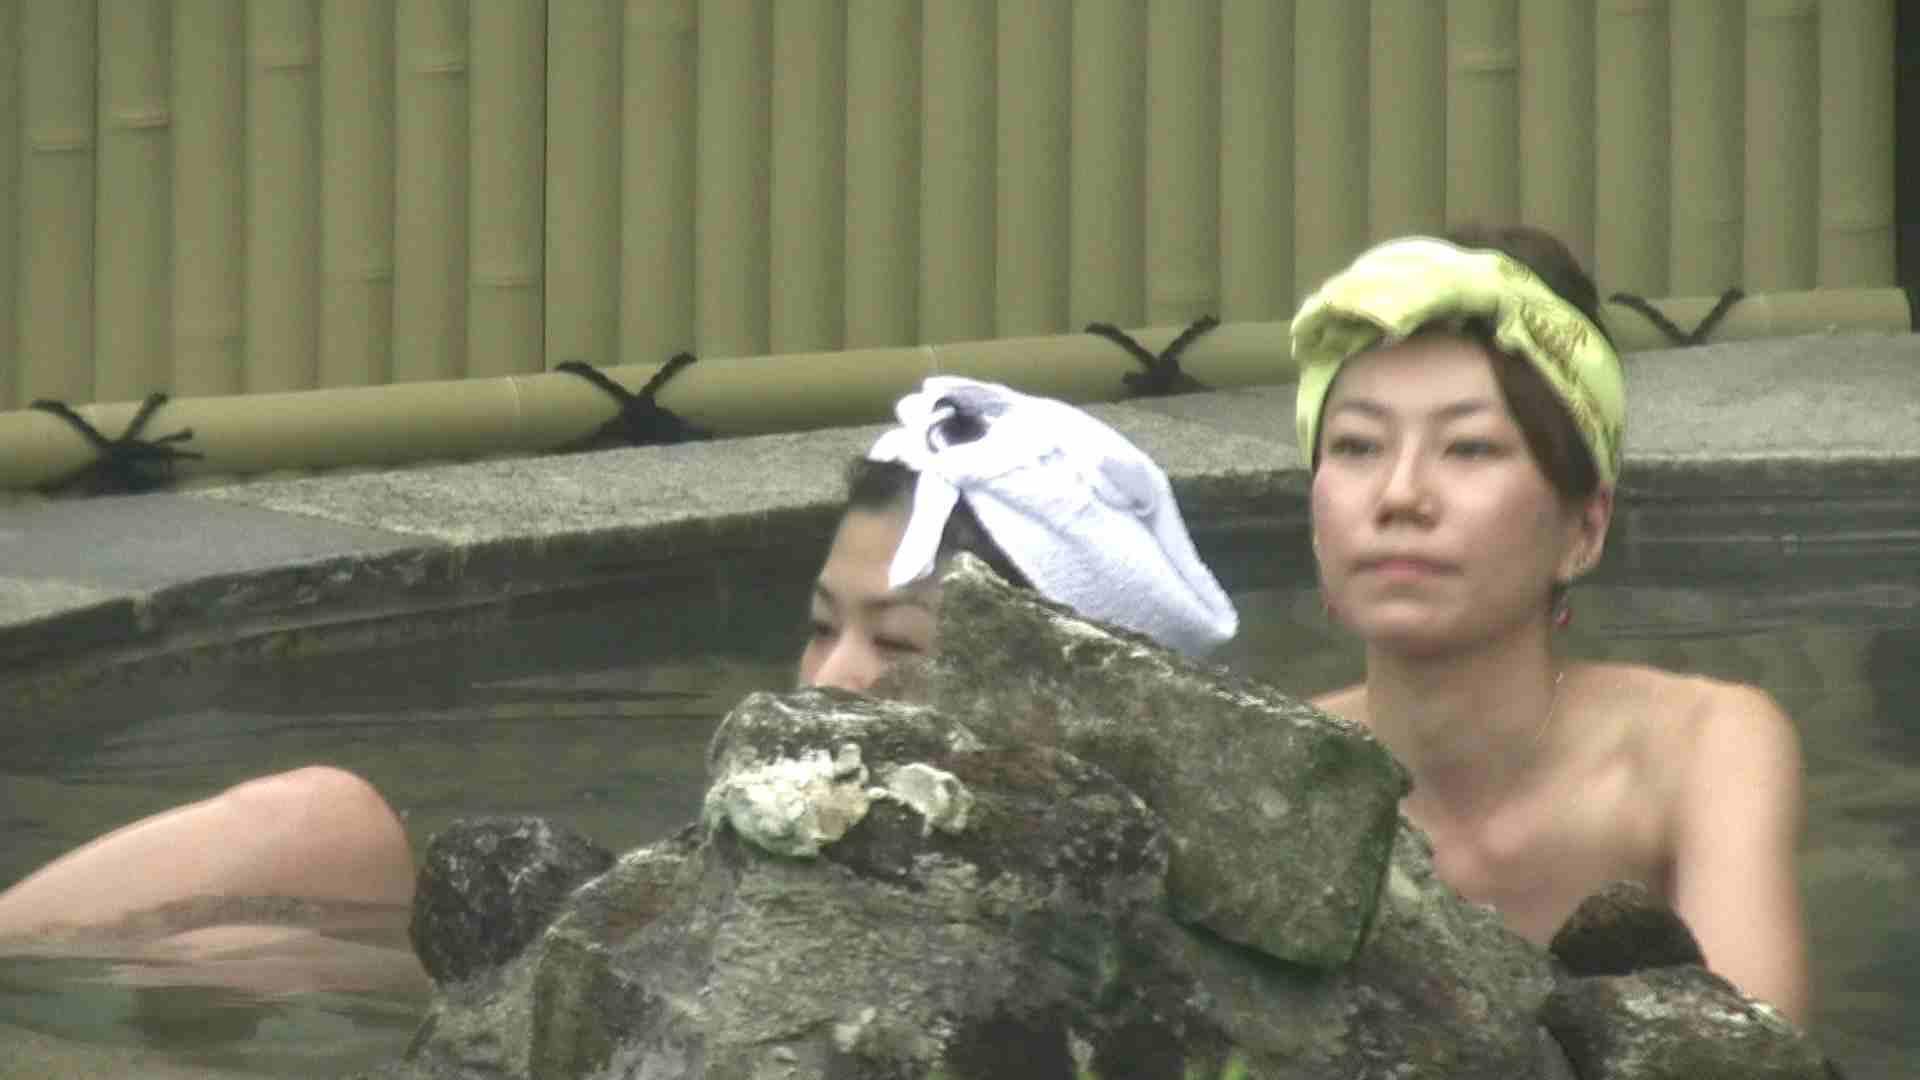 Aquaな露天風呂Vol.192 露天風呂 | OLのエロ生活  79連発 52